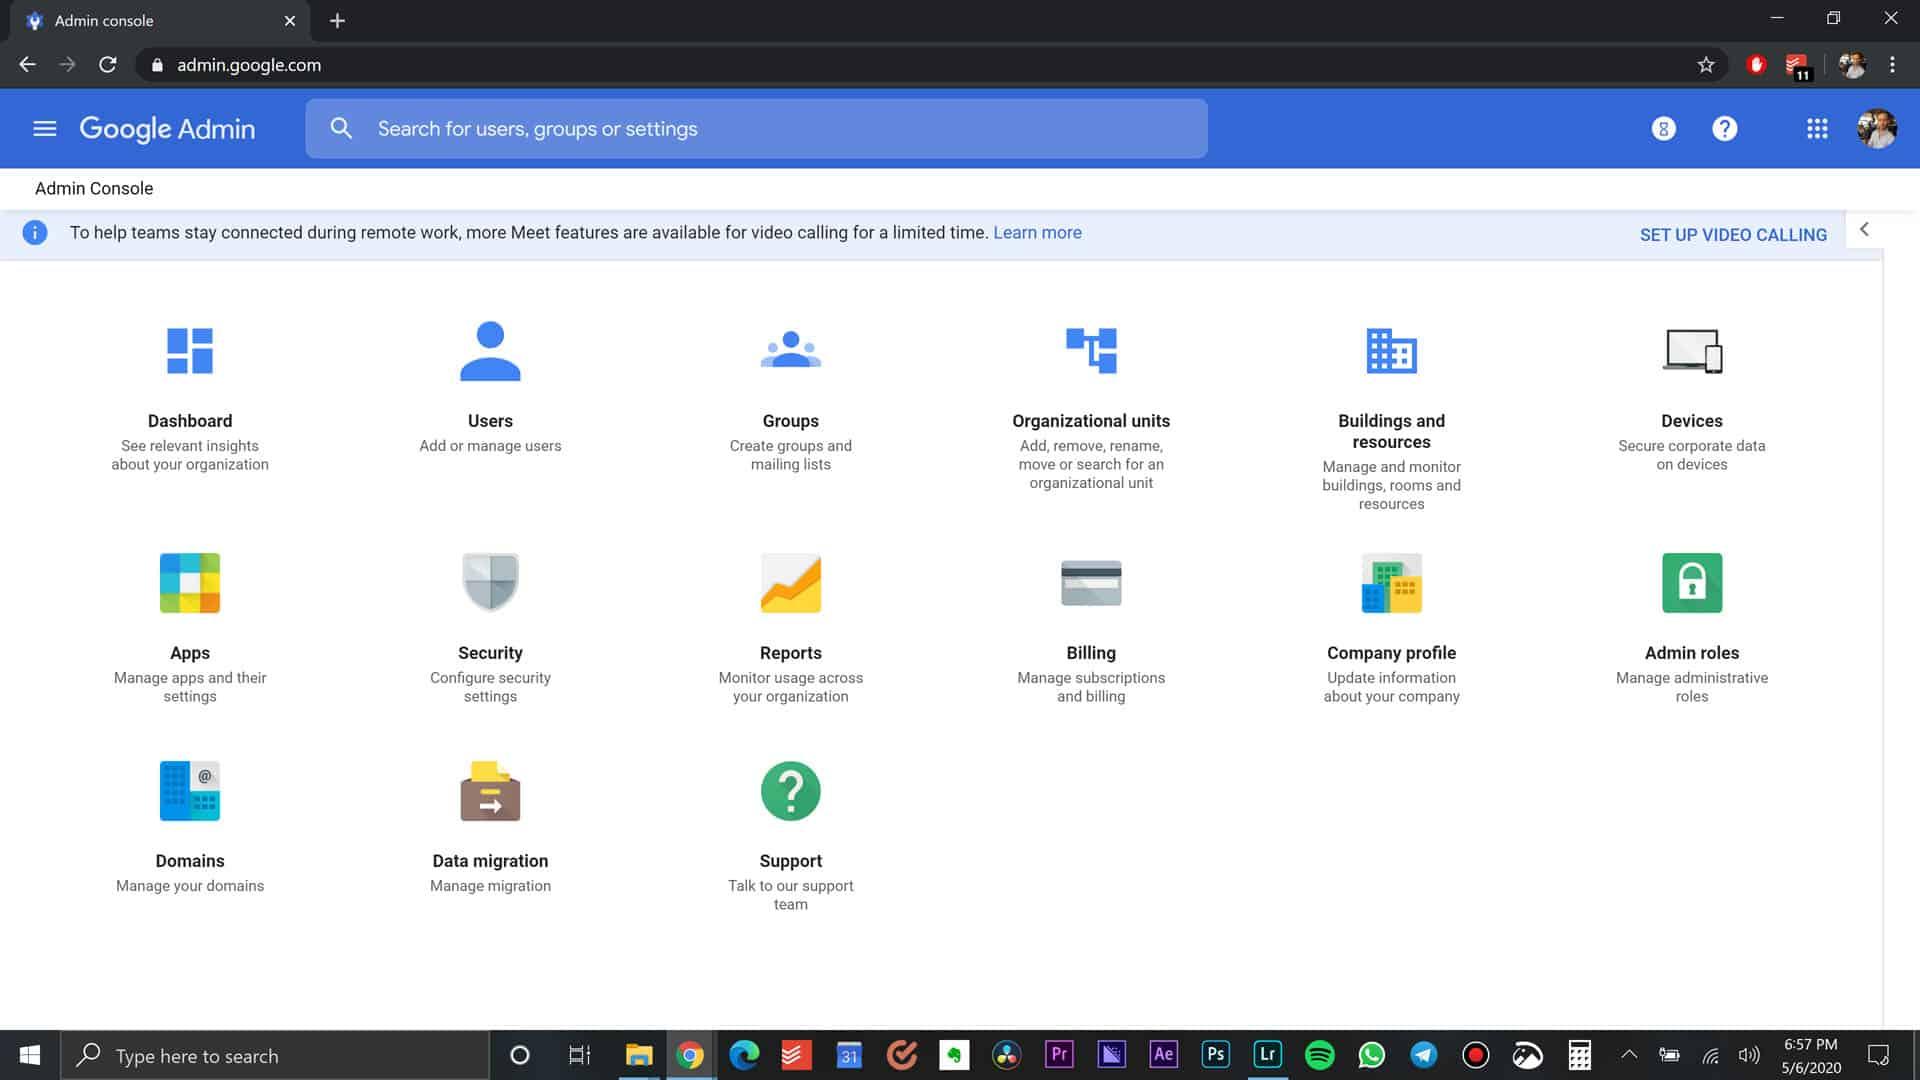 Google Admin Page